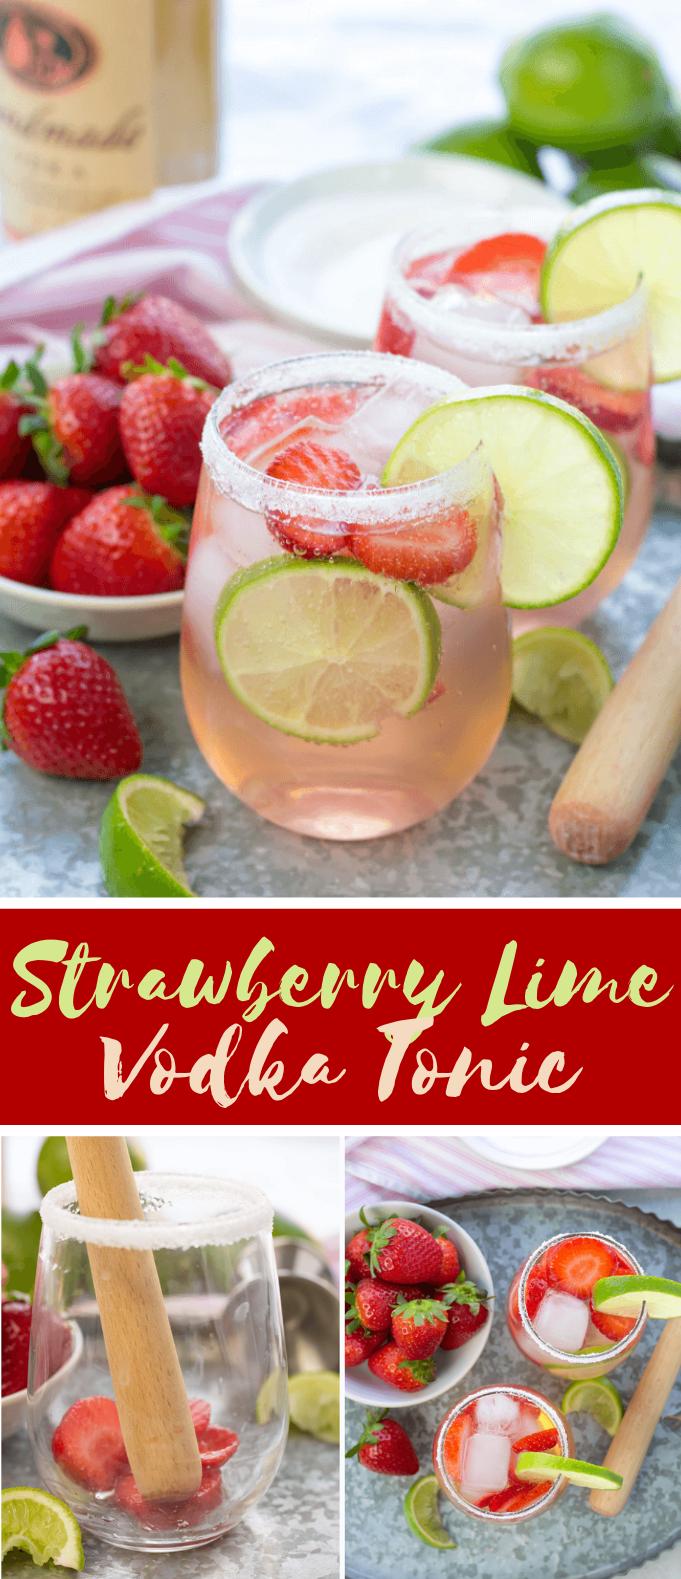 STRAWBERRY LIME VODKA TONIC #cocktails #freshdrink